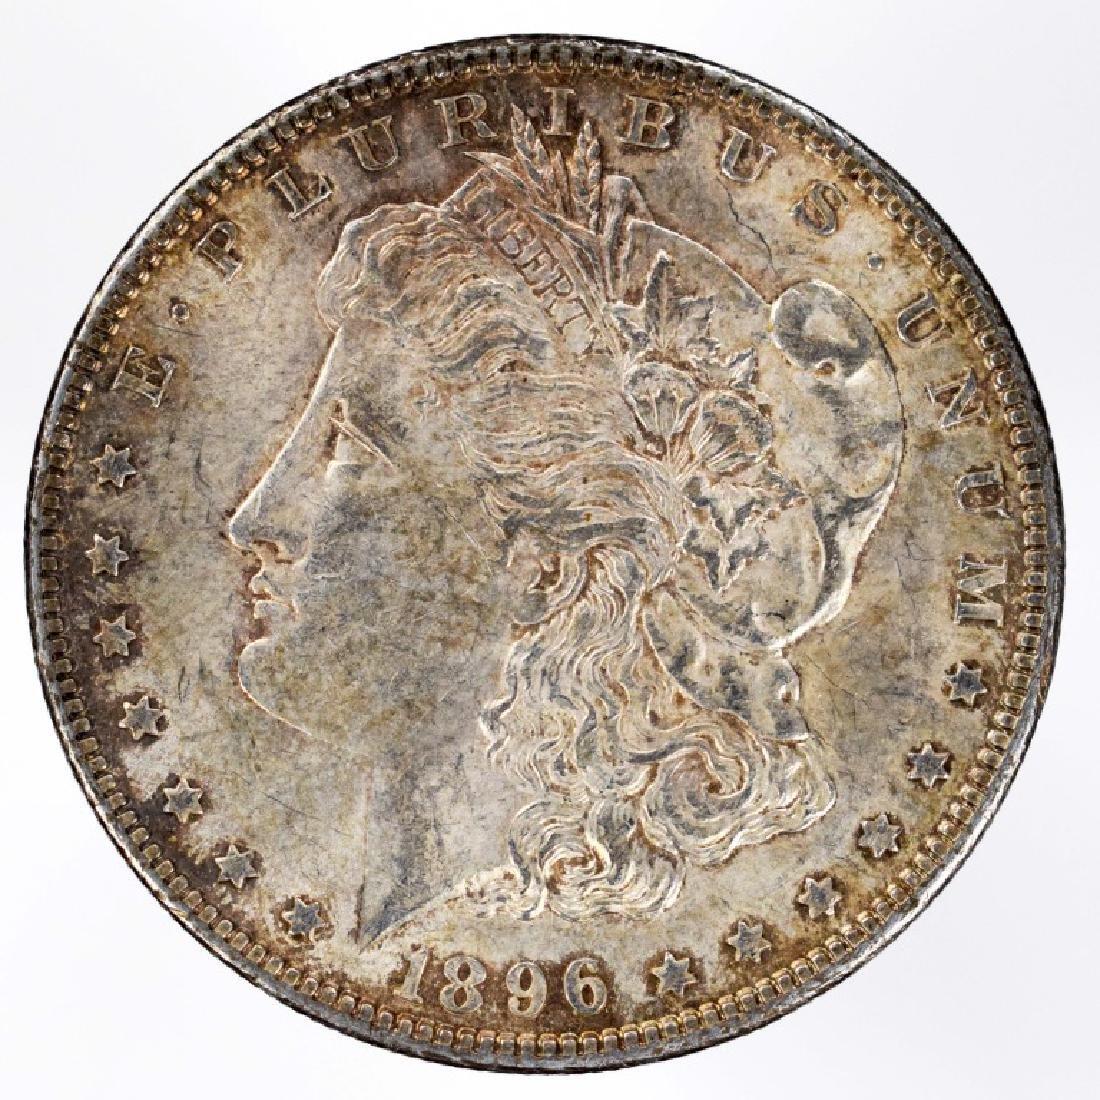 1896 Morgan Silver Dollar 1896 Philadelphia